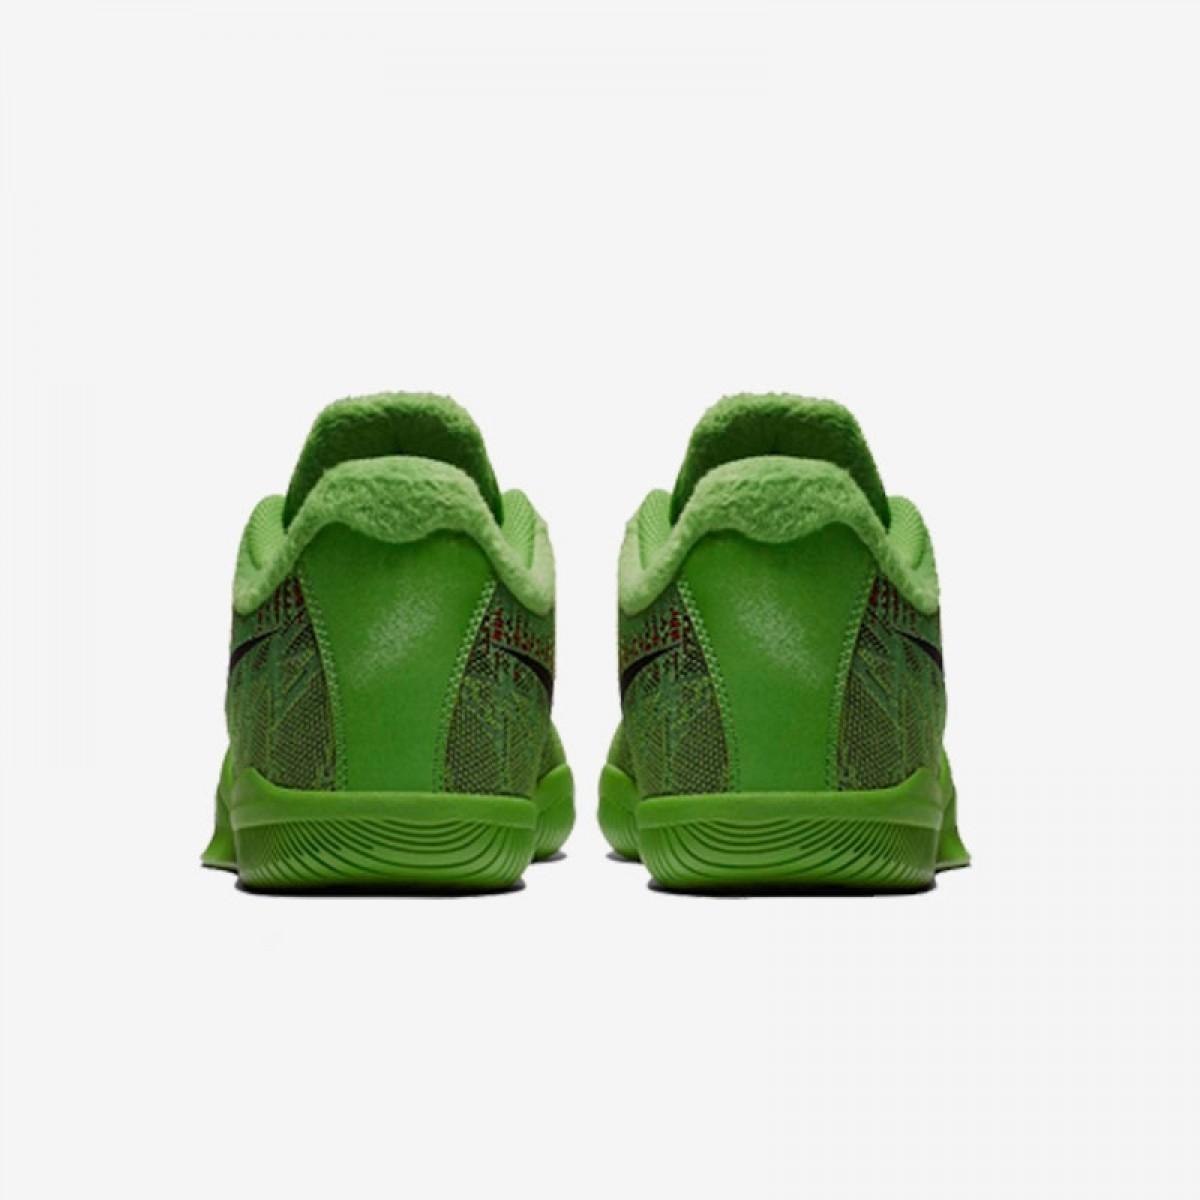 Nike Mamba Rage GS 'Grinch'  908972-300Jr